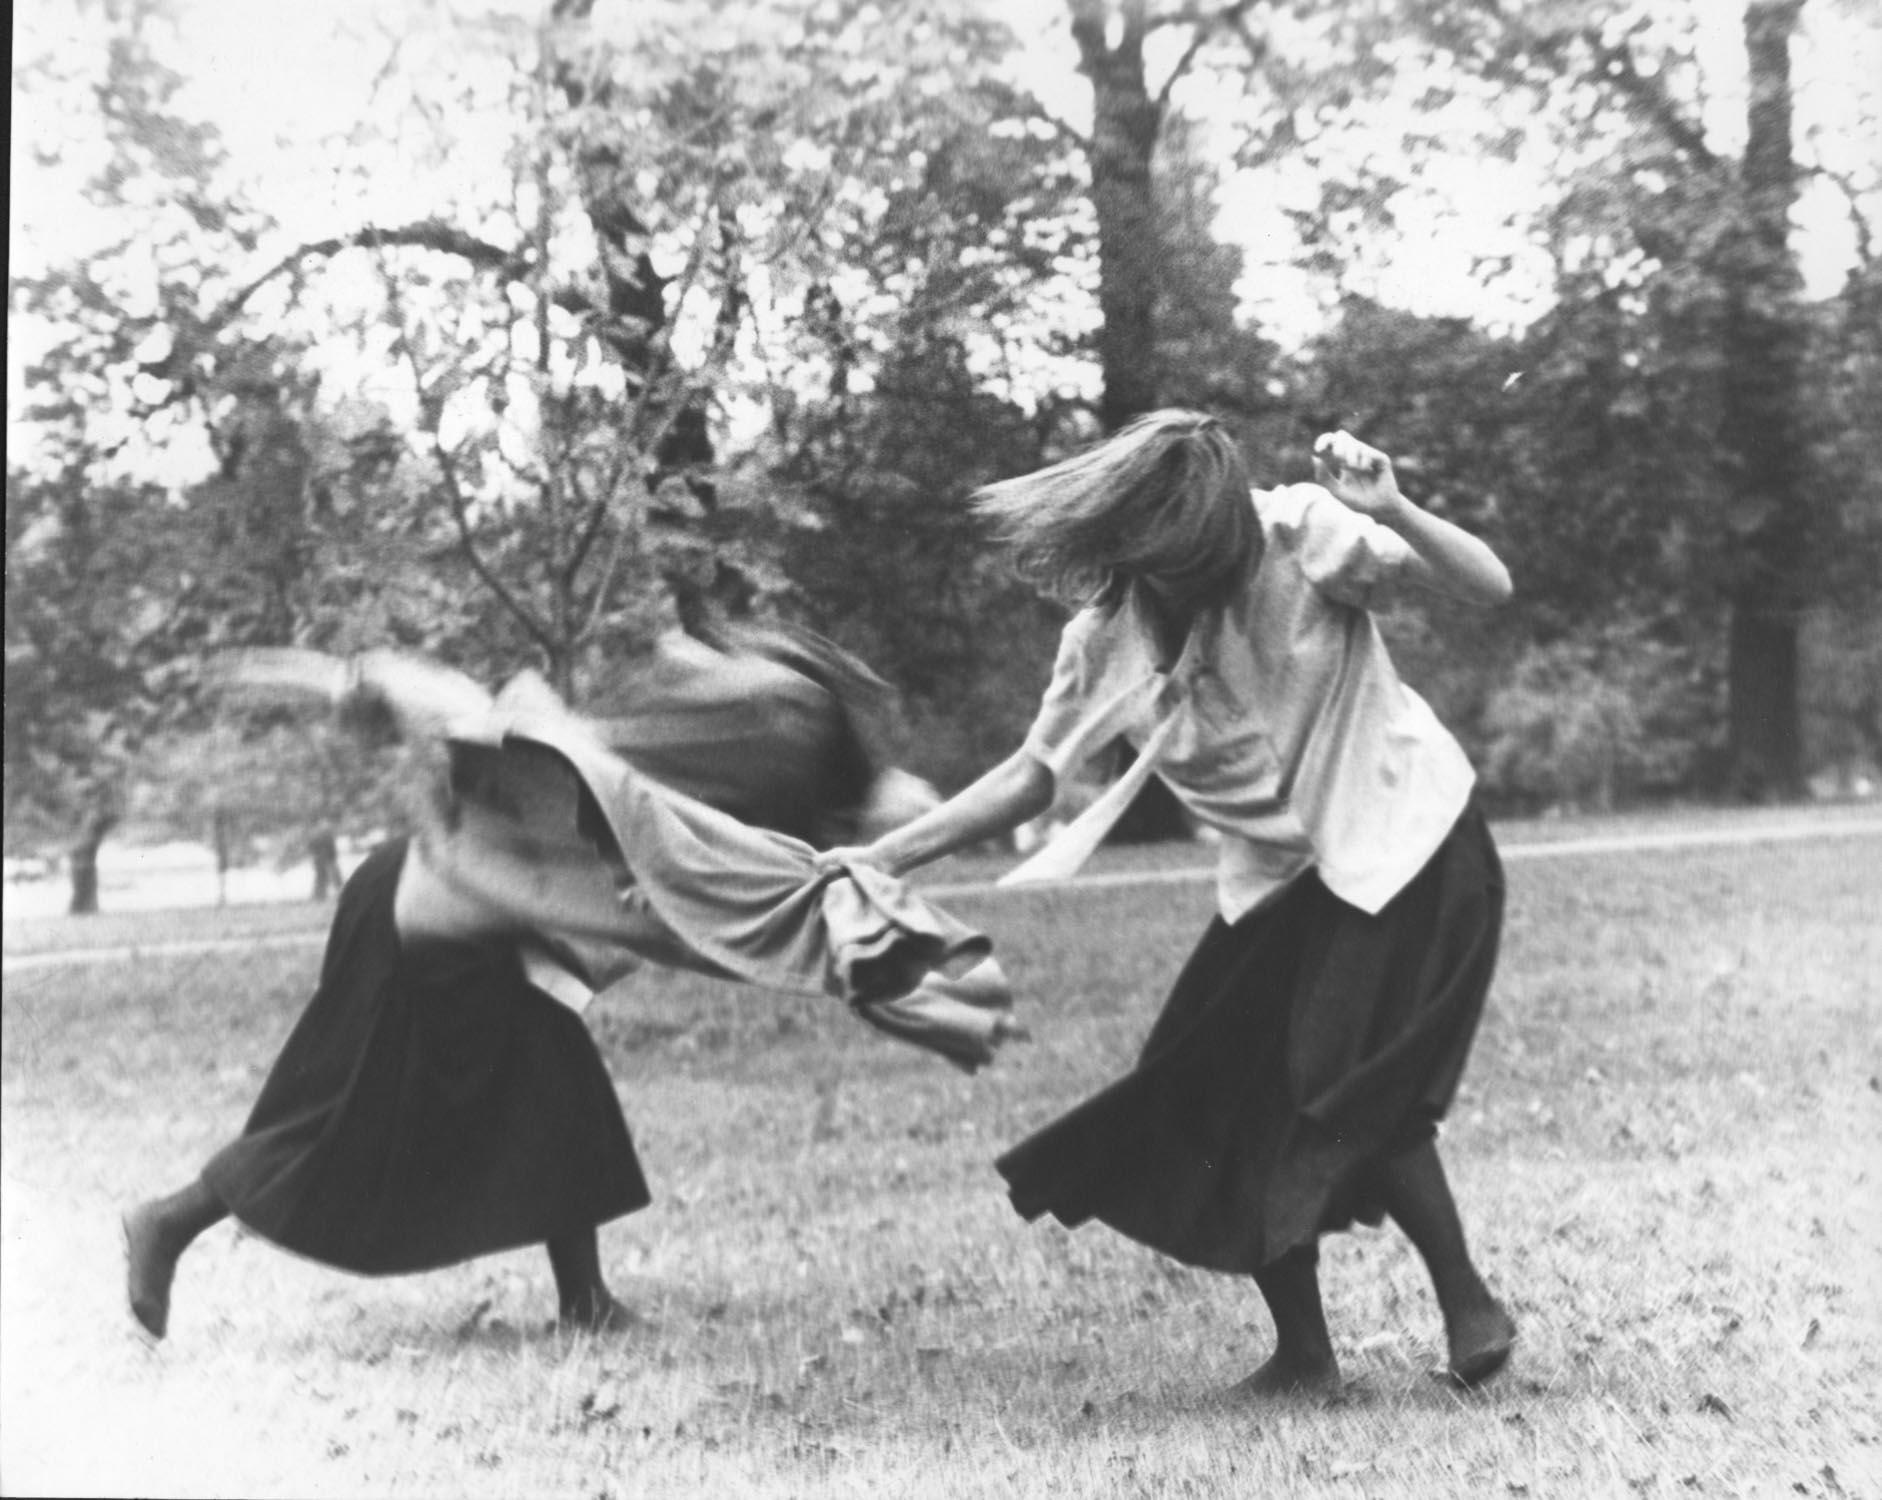 Rose English, Jacky Lansley, Lynn MacRitchie, Sally Potter, Judith Katz and Sylvia Stevens, Park Cafeteria, 1975. Serpentine Gallery, London. Photo - Geoff White